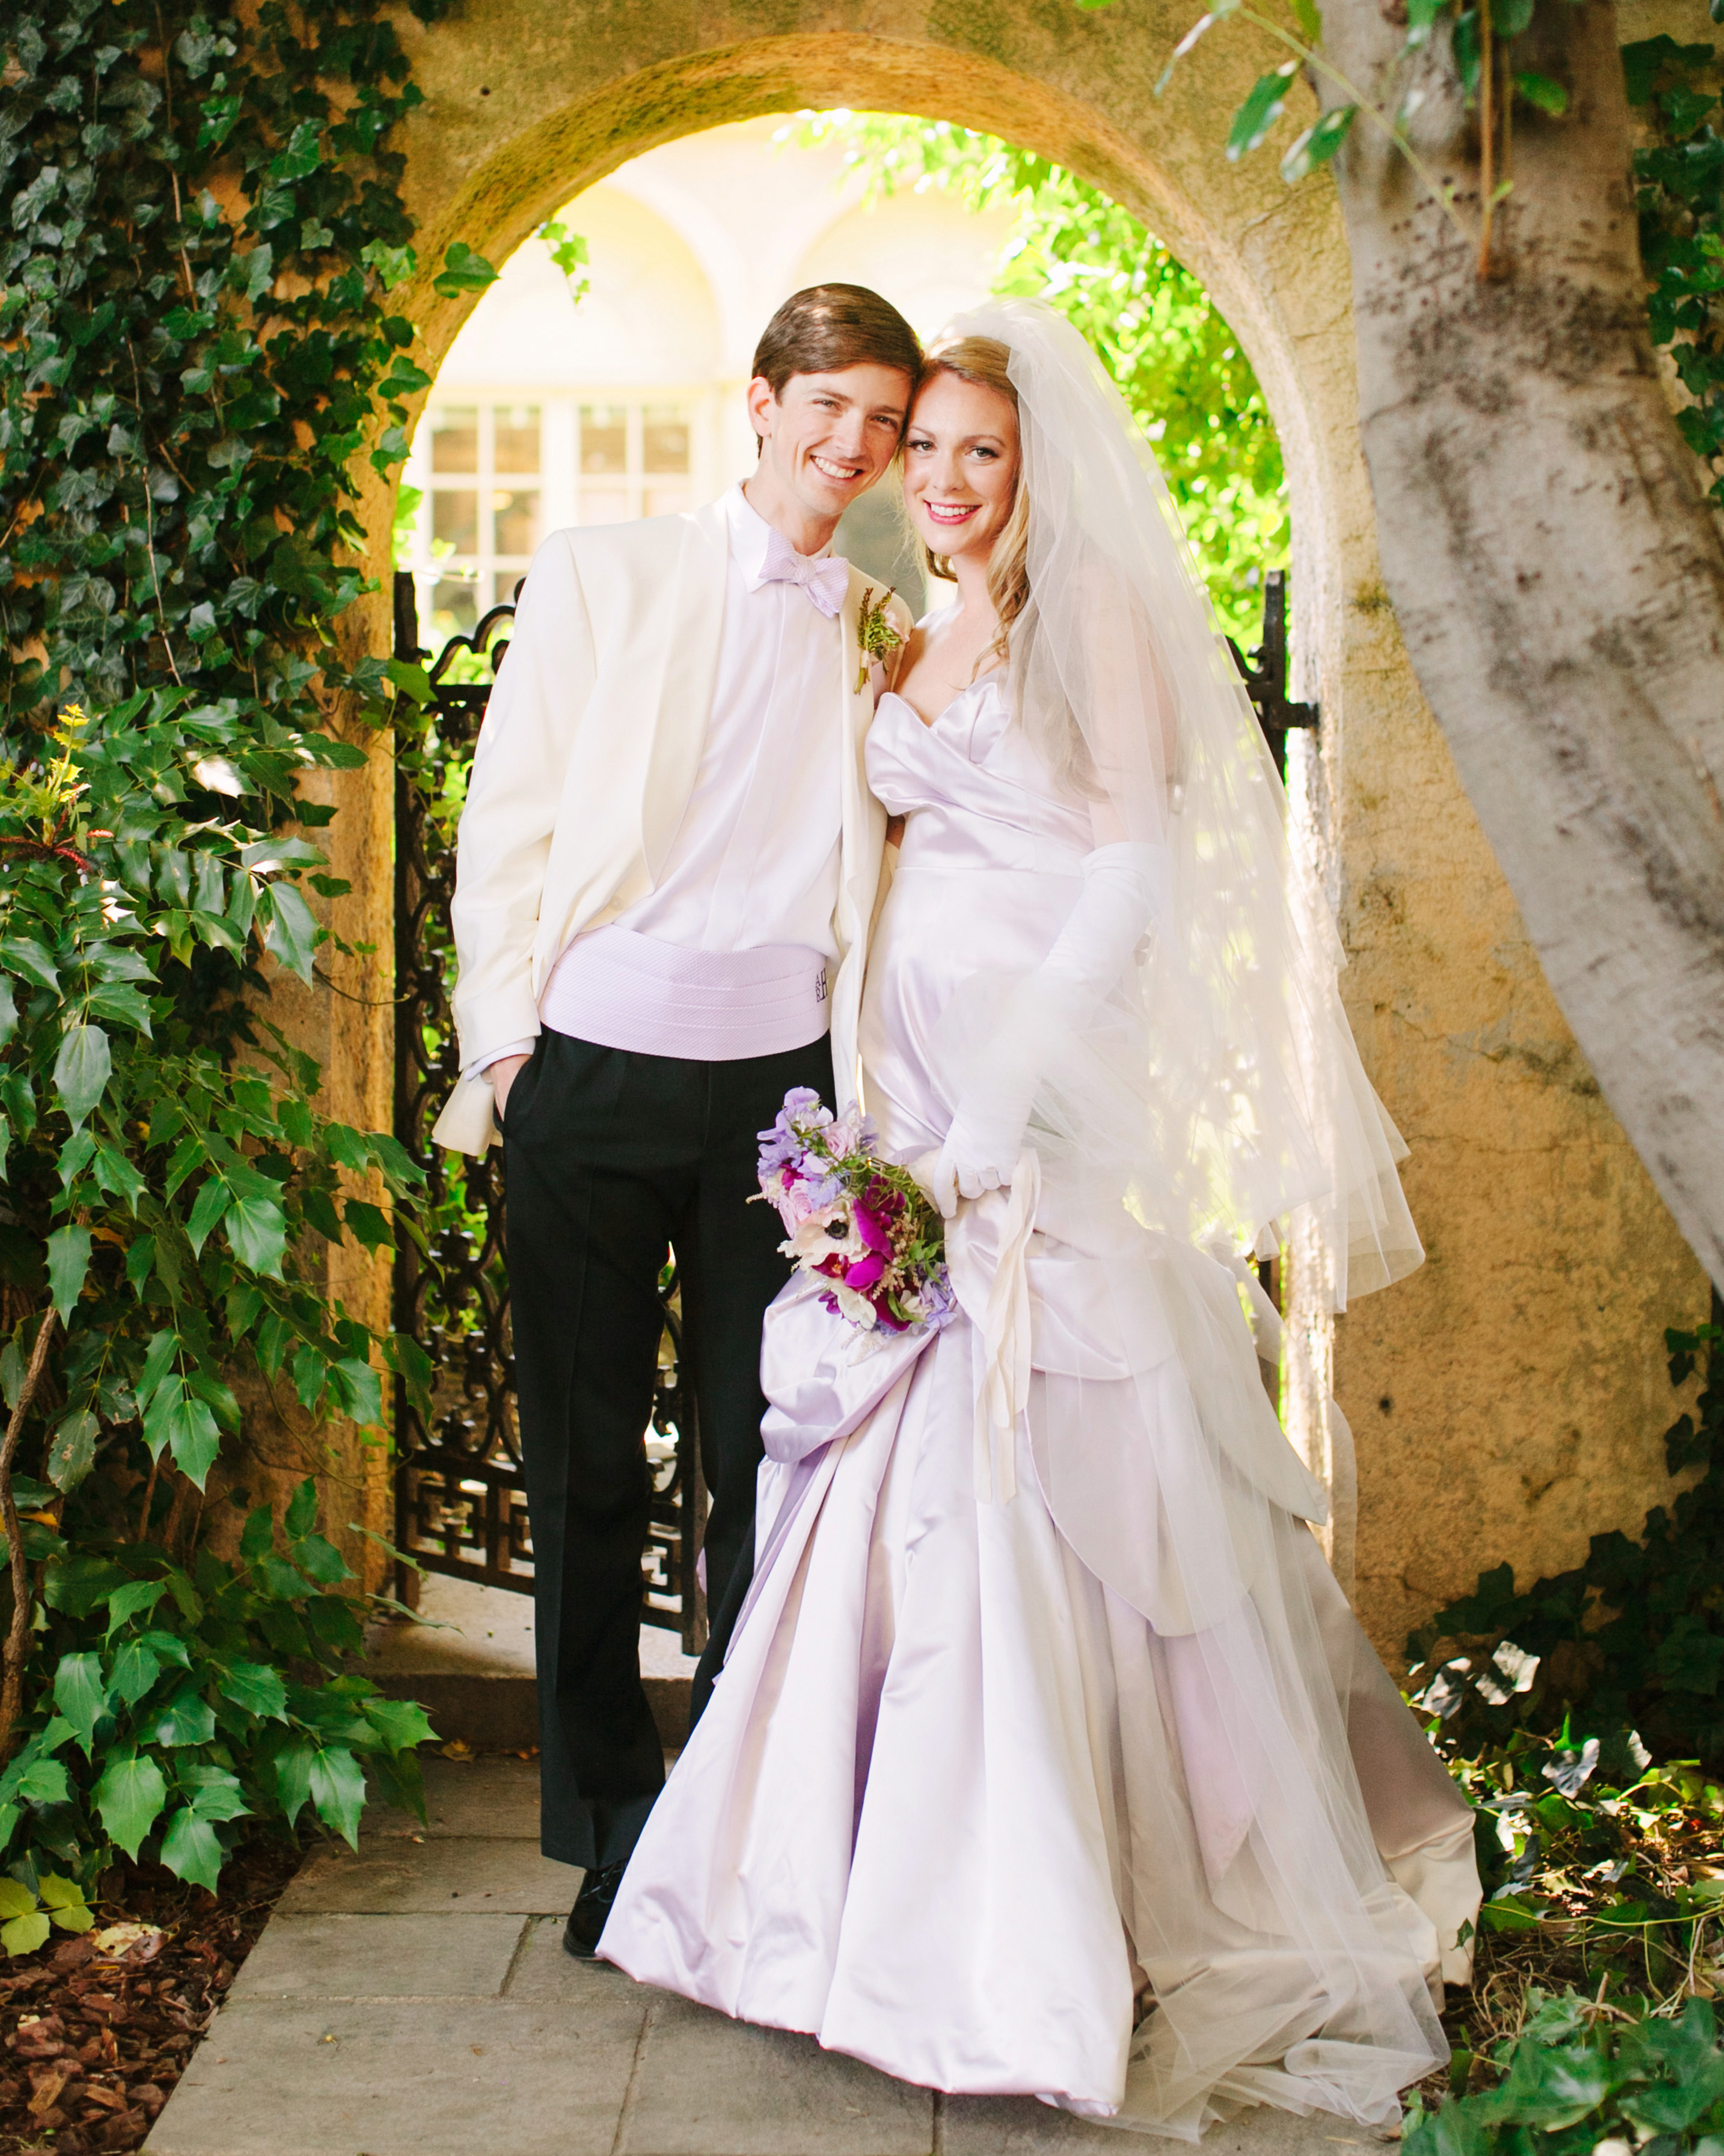 katelyn-austin-wedding-virgina-ka0375-s111979-0615.jpg